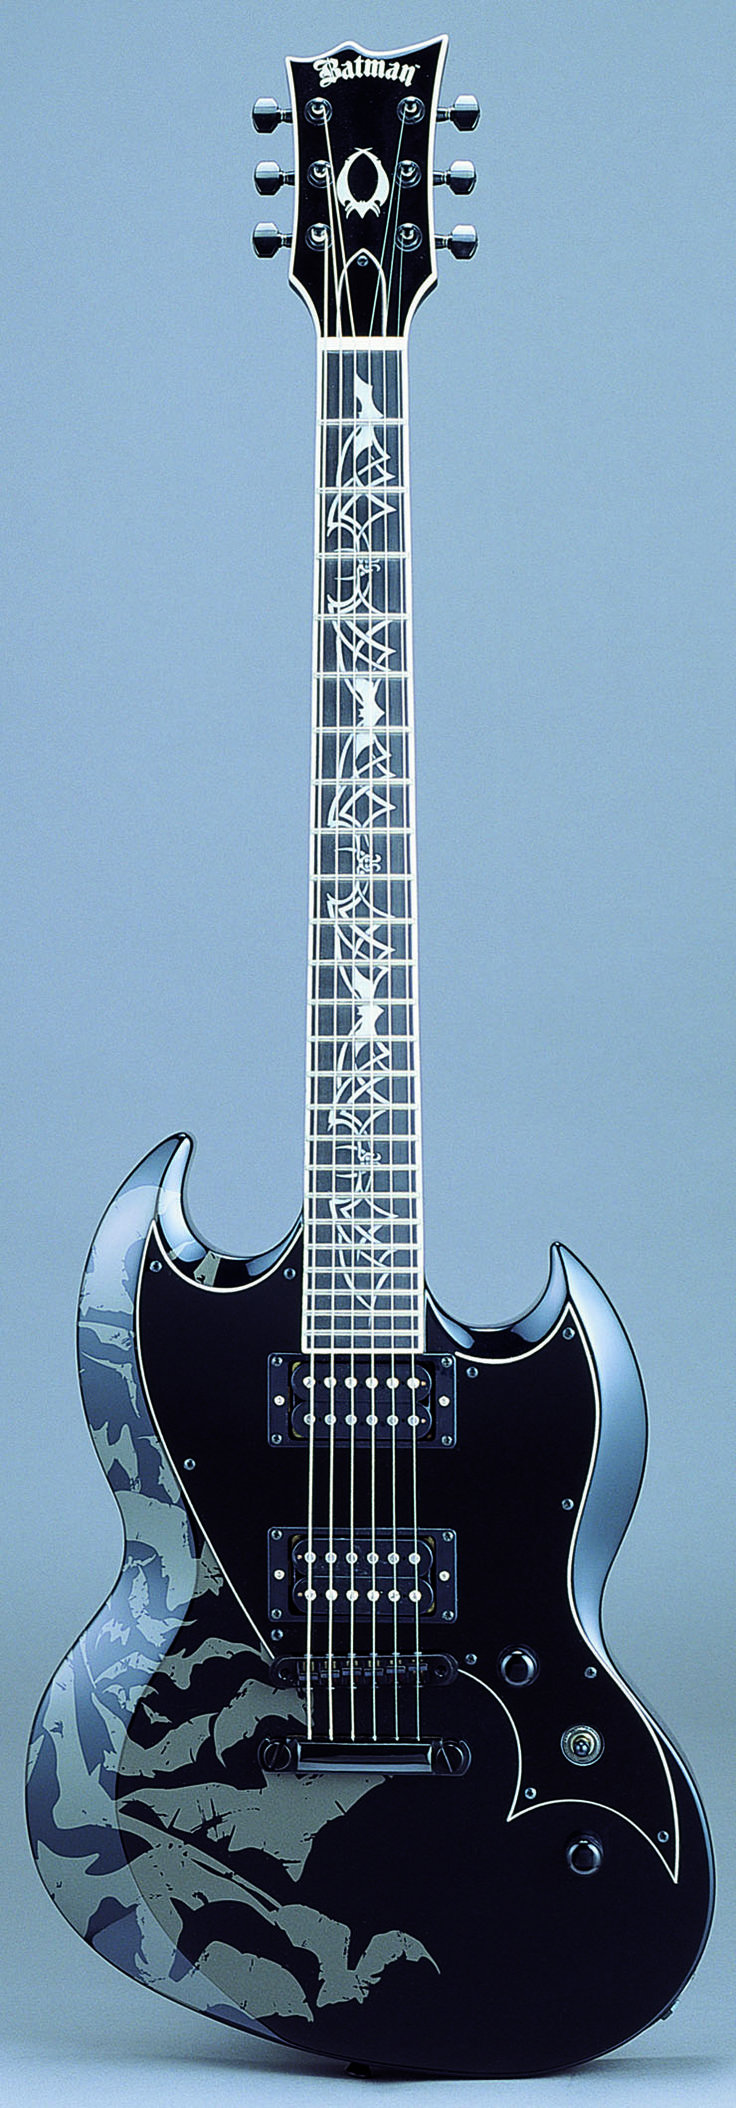 Japanese-made ESP Viper 'Batman' edition http://www.espguitars.co.jp/batman/ - those inlays drive me insane?